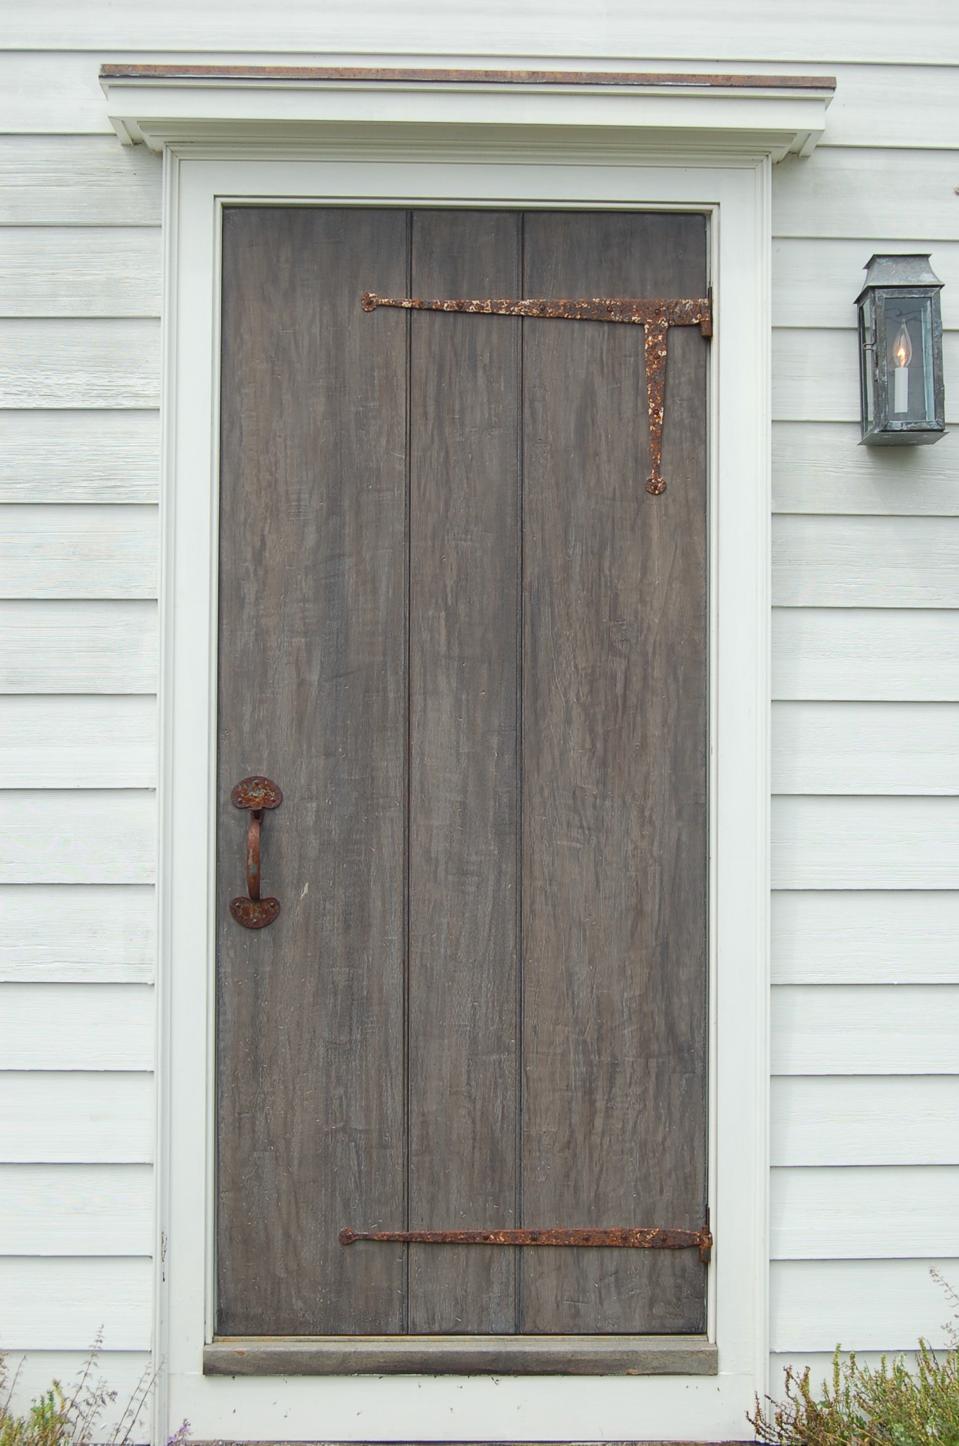 The Feake-Ferris House front door.